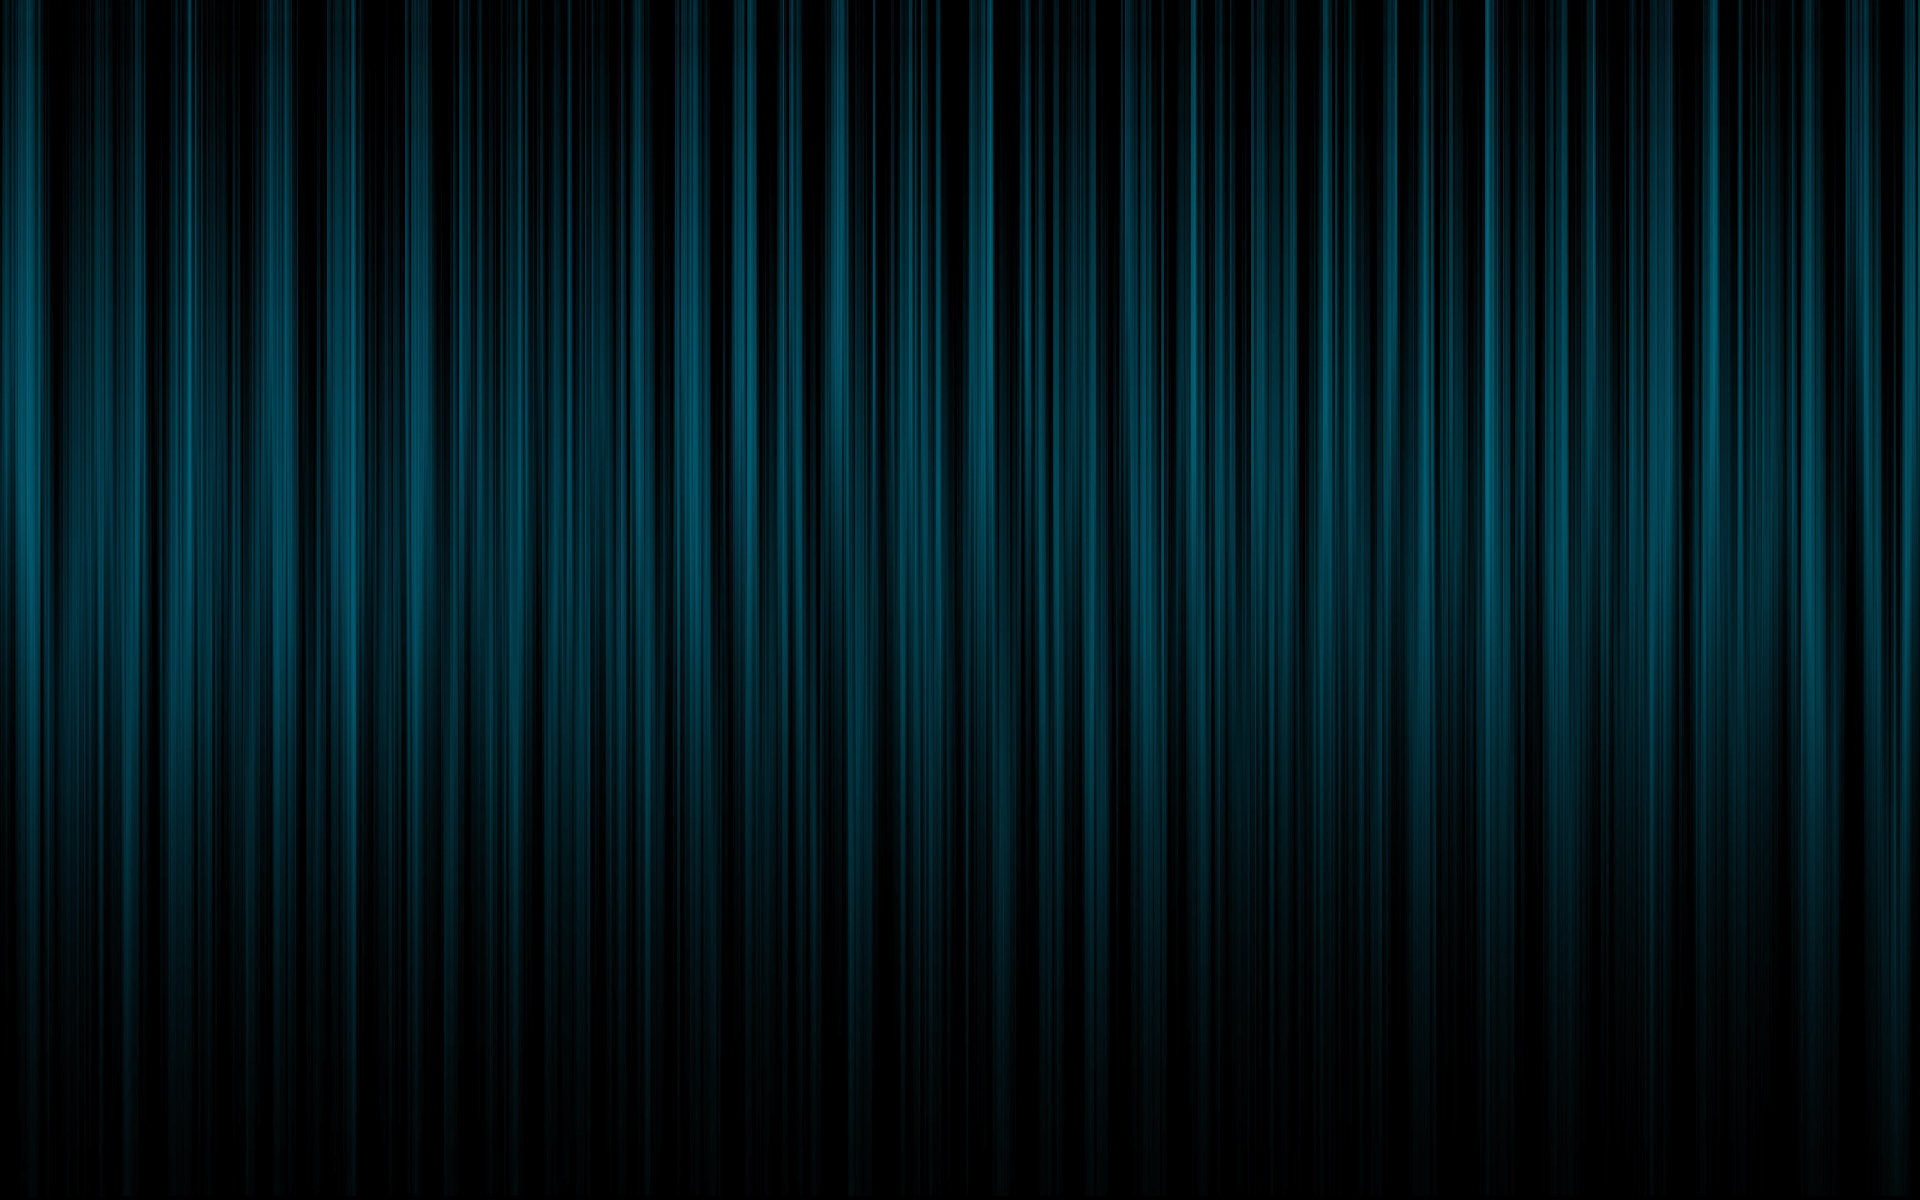 Black 3d background for 3d wallpaper hd home decor